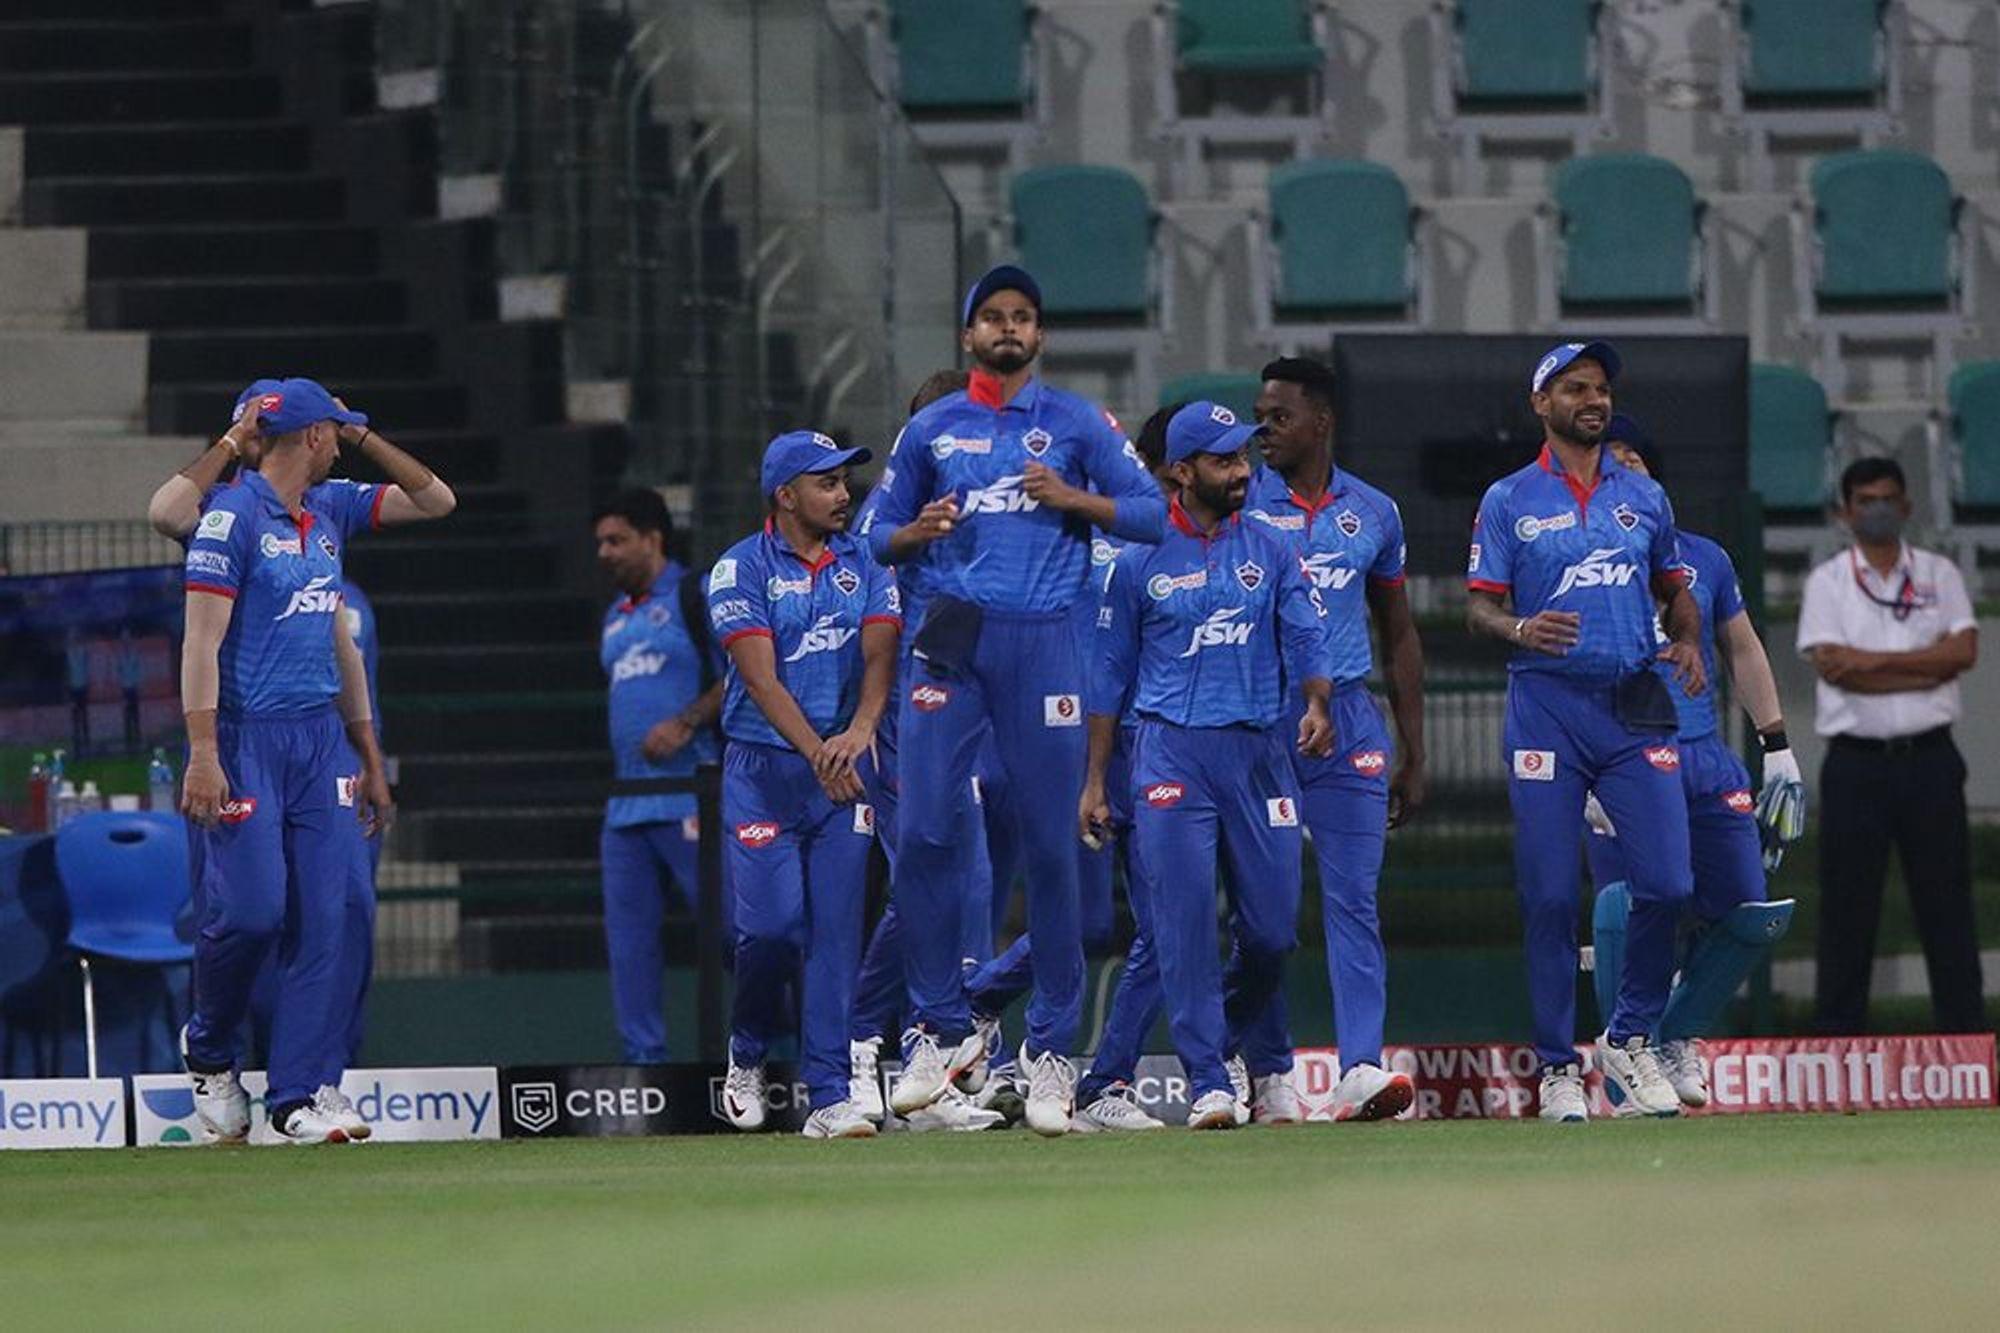 DC overcame their four-game losing streak versus RCB | Twitter/Delhi Capitals